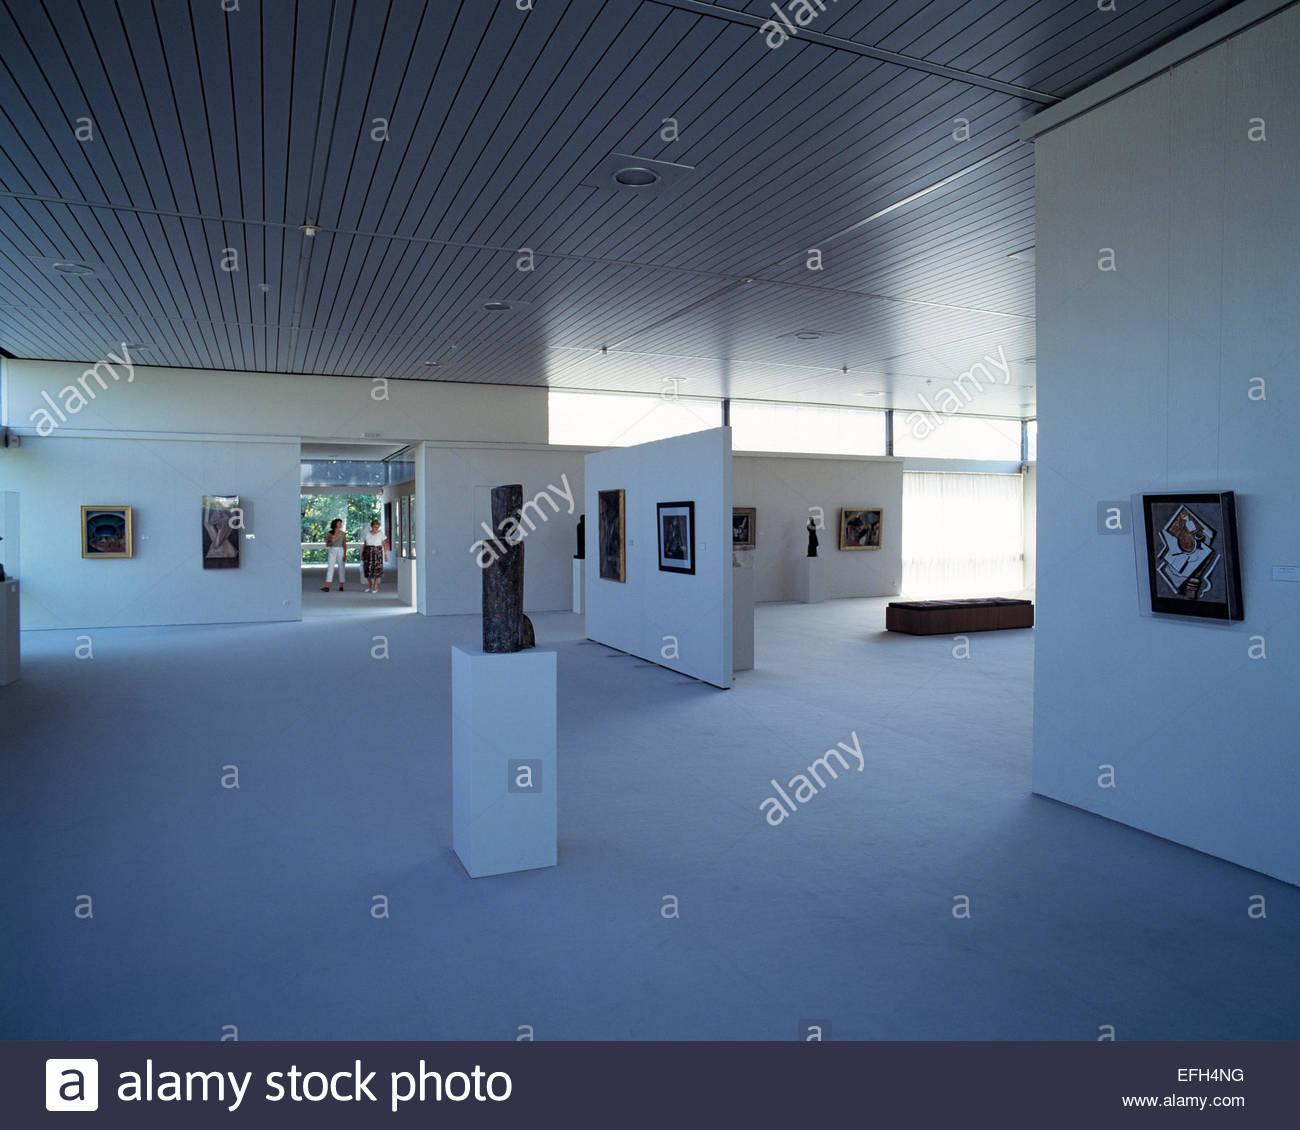 D-Saarbruecken, Saar, Saarland, Saarlandmuseum, Moderne Galerie, Innenansicht, Ausstellungsraum, Kunstobjekte, D Stock Photo